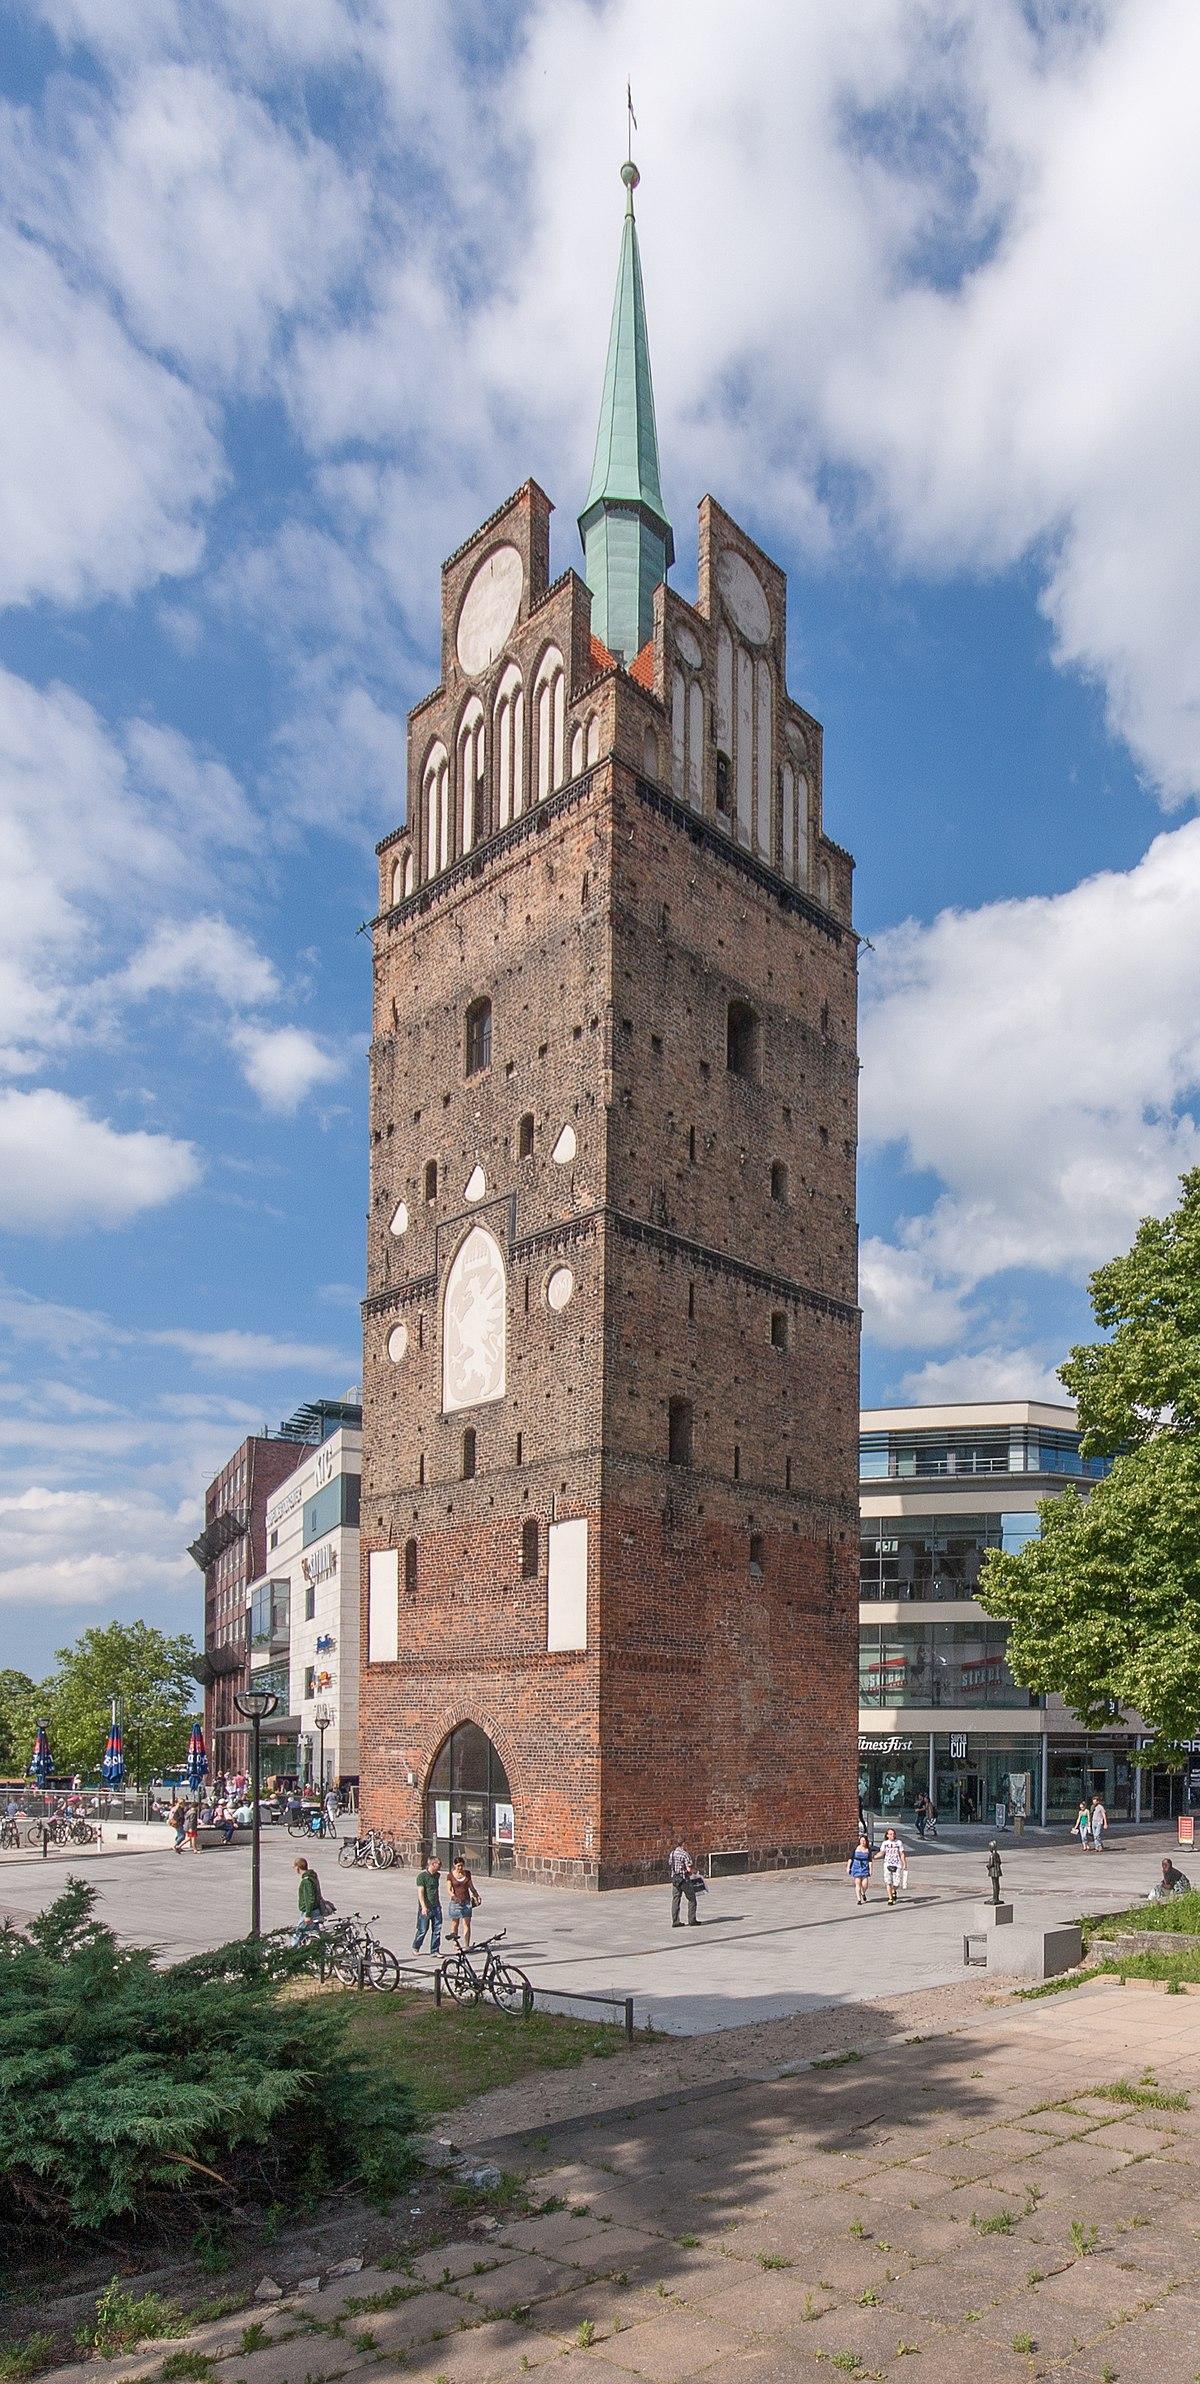 MK 36031 Kröpeliner Tor (Rostock).jpg